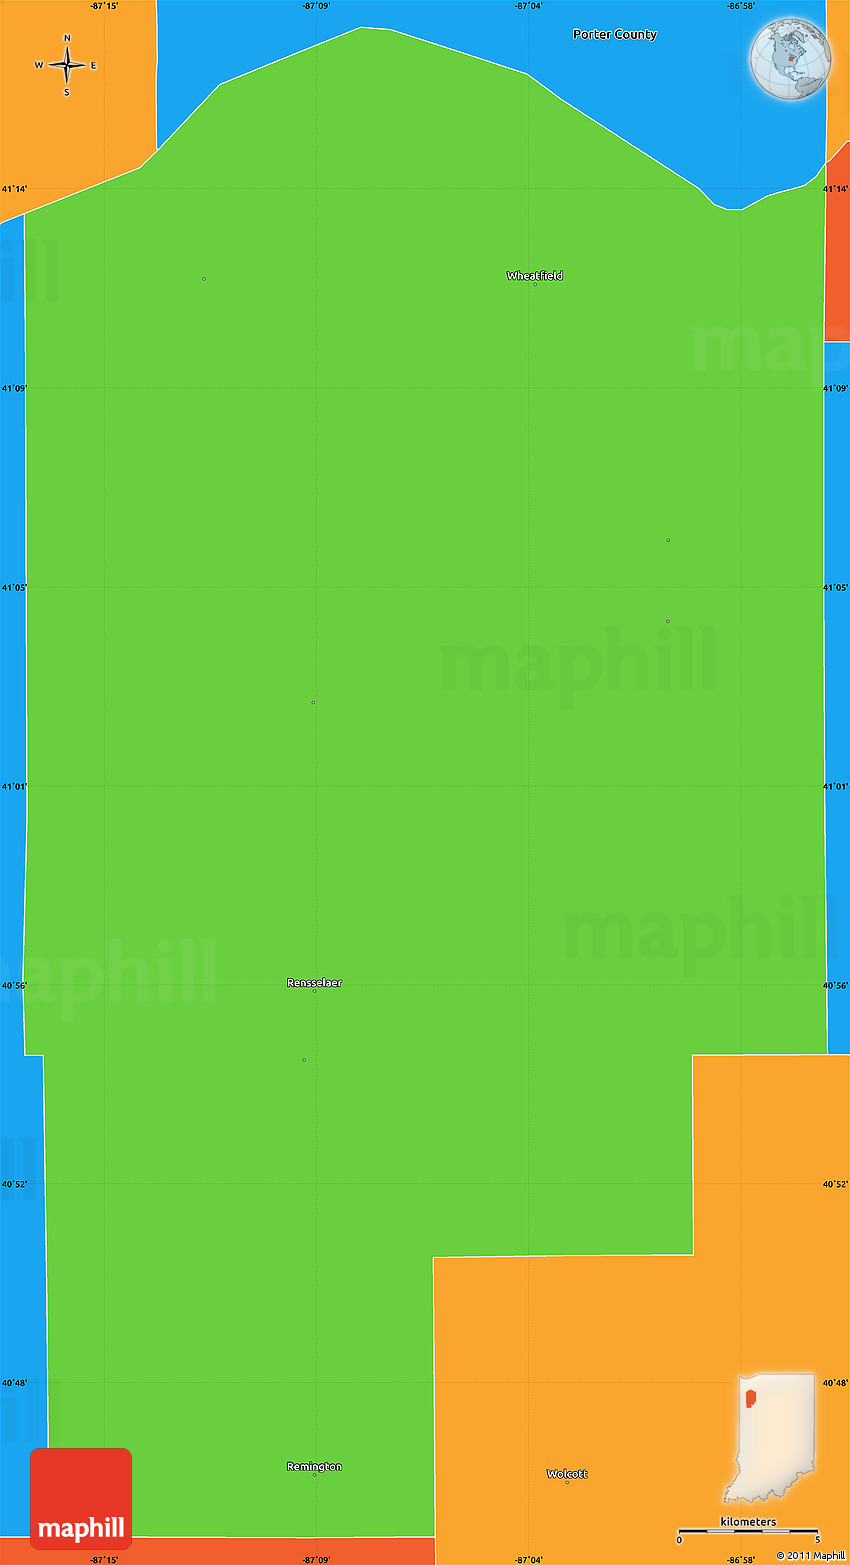 Indiana jasper county tefft - 2d